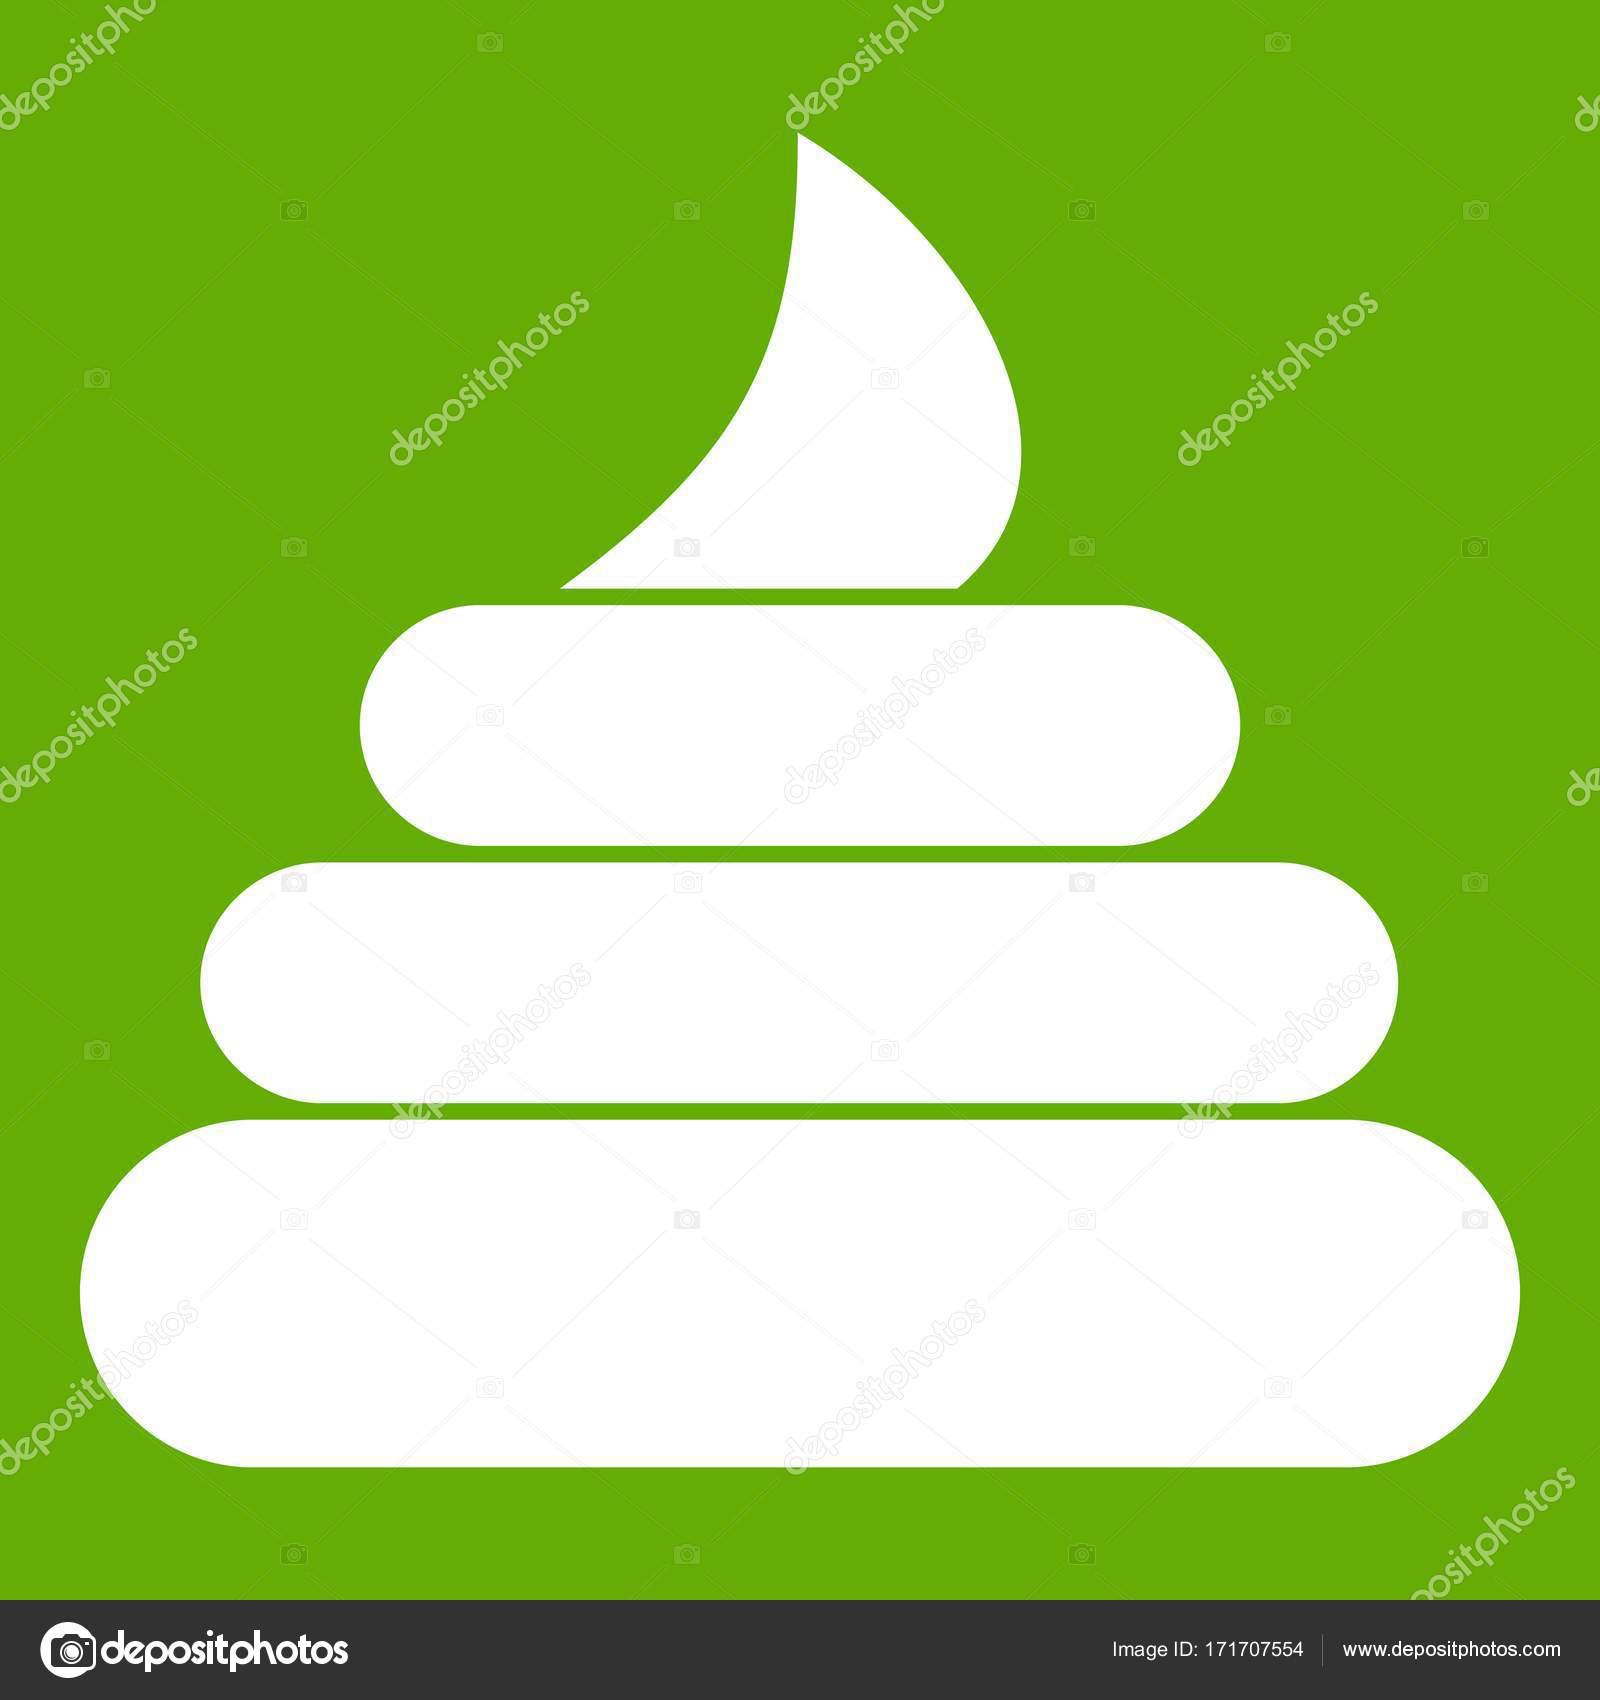 Stuhlgang Symbol Grün Stockvektor Ylivdesign 171707554